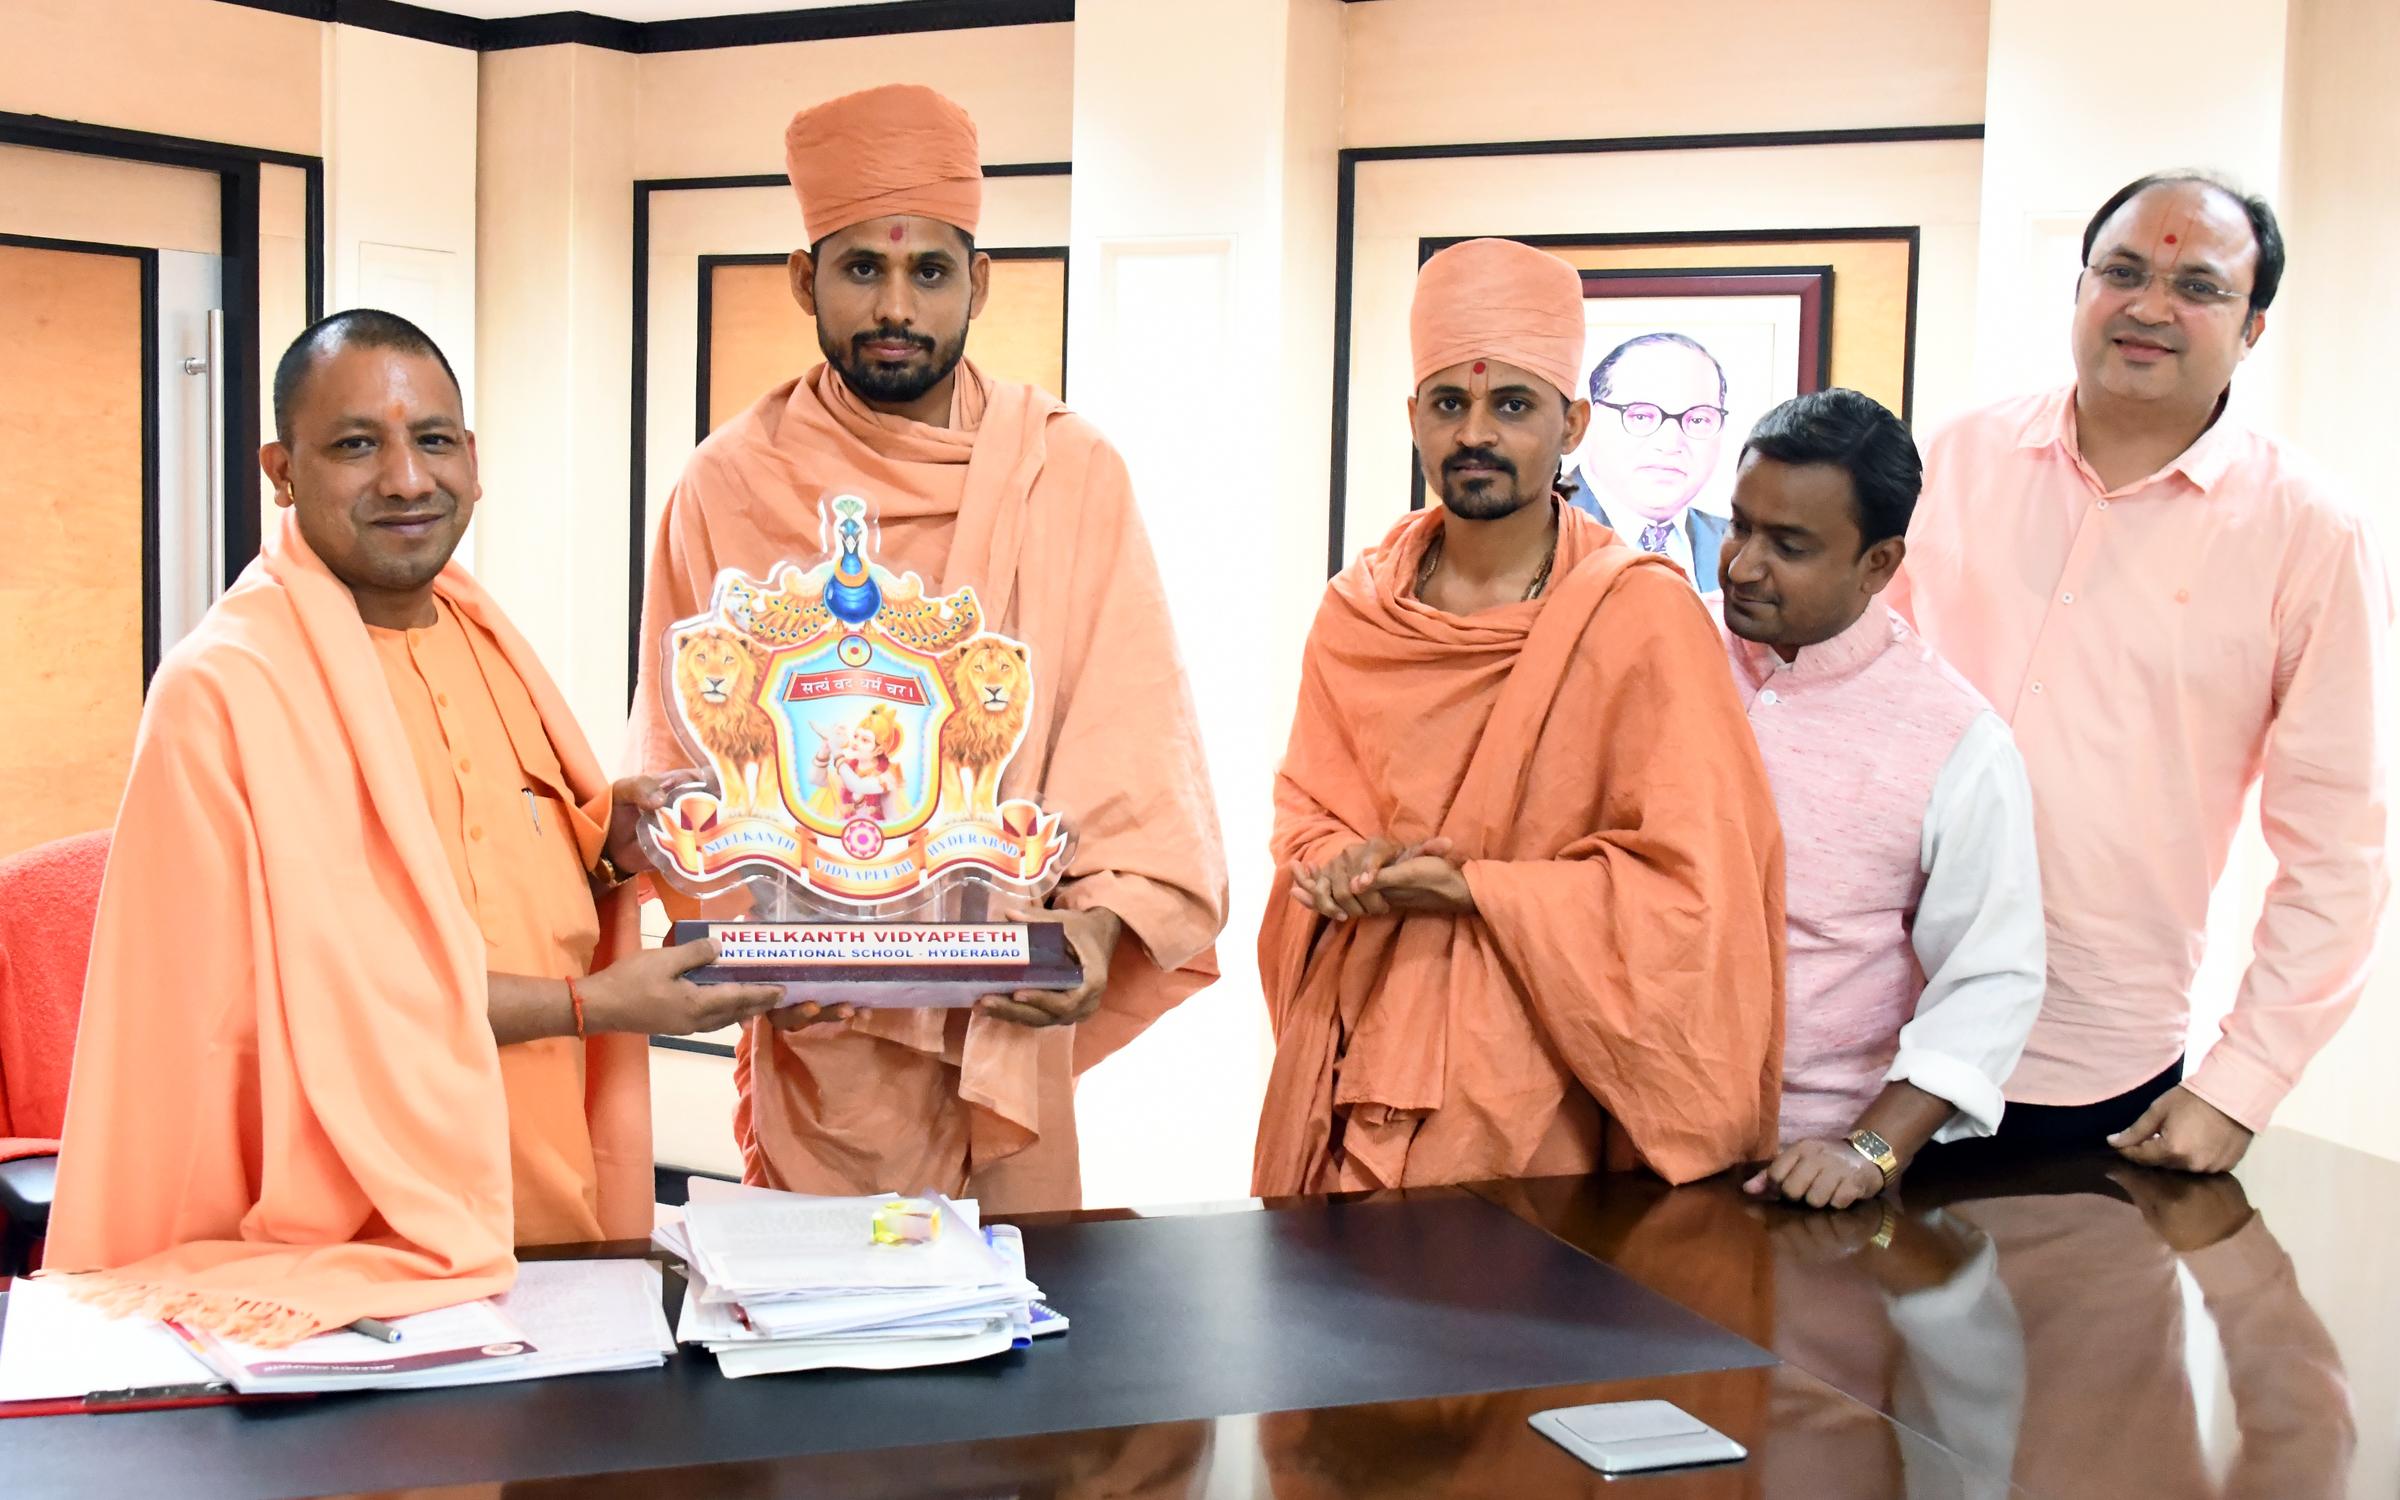 Saints of Swamy Narayan met SHRI YOGI ADITYANATH